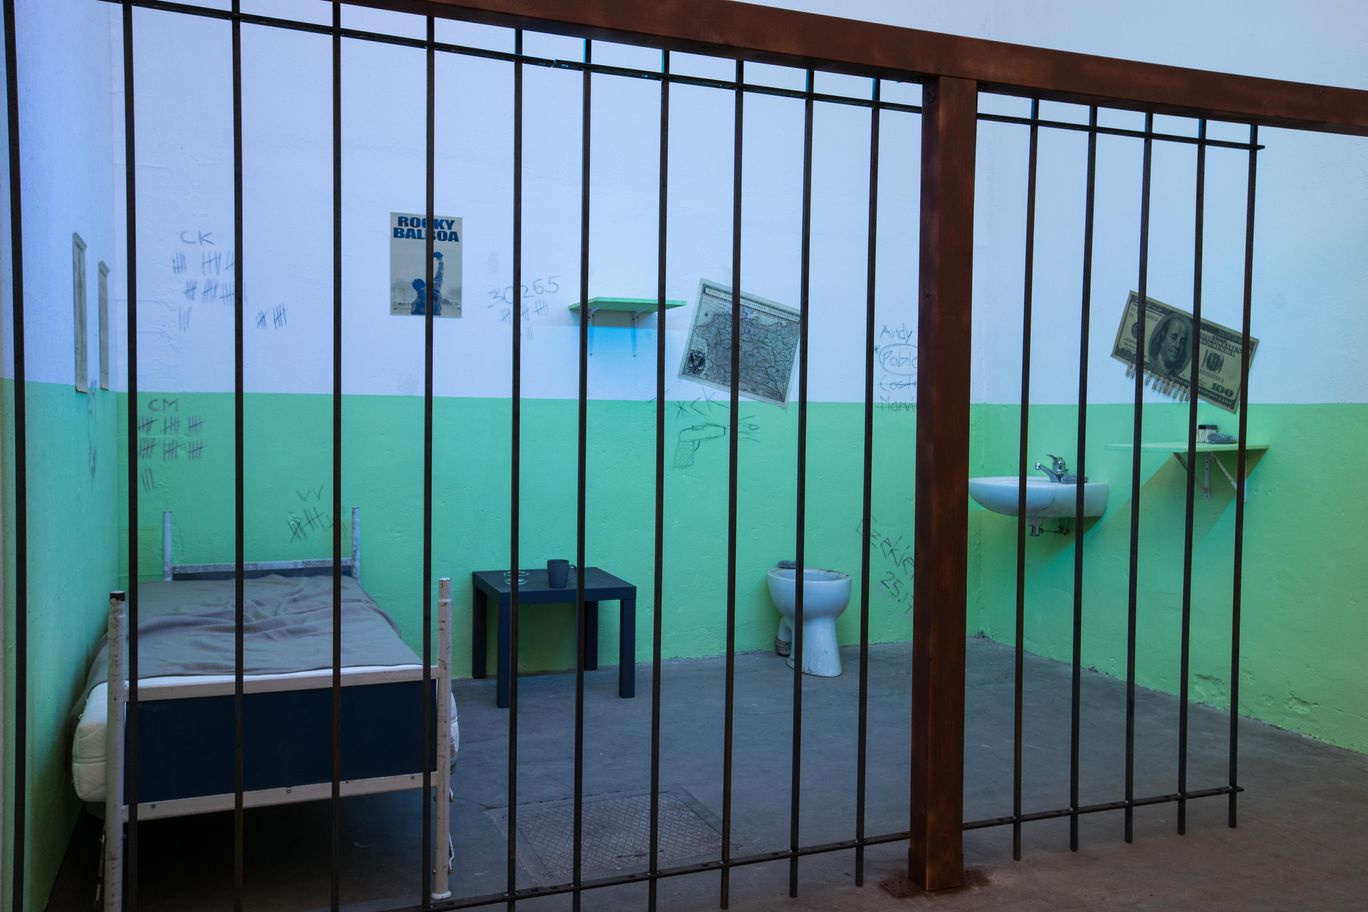 Gefängnis mieten Fotostudio